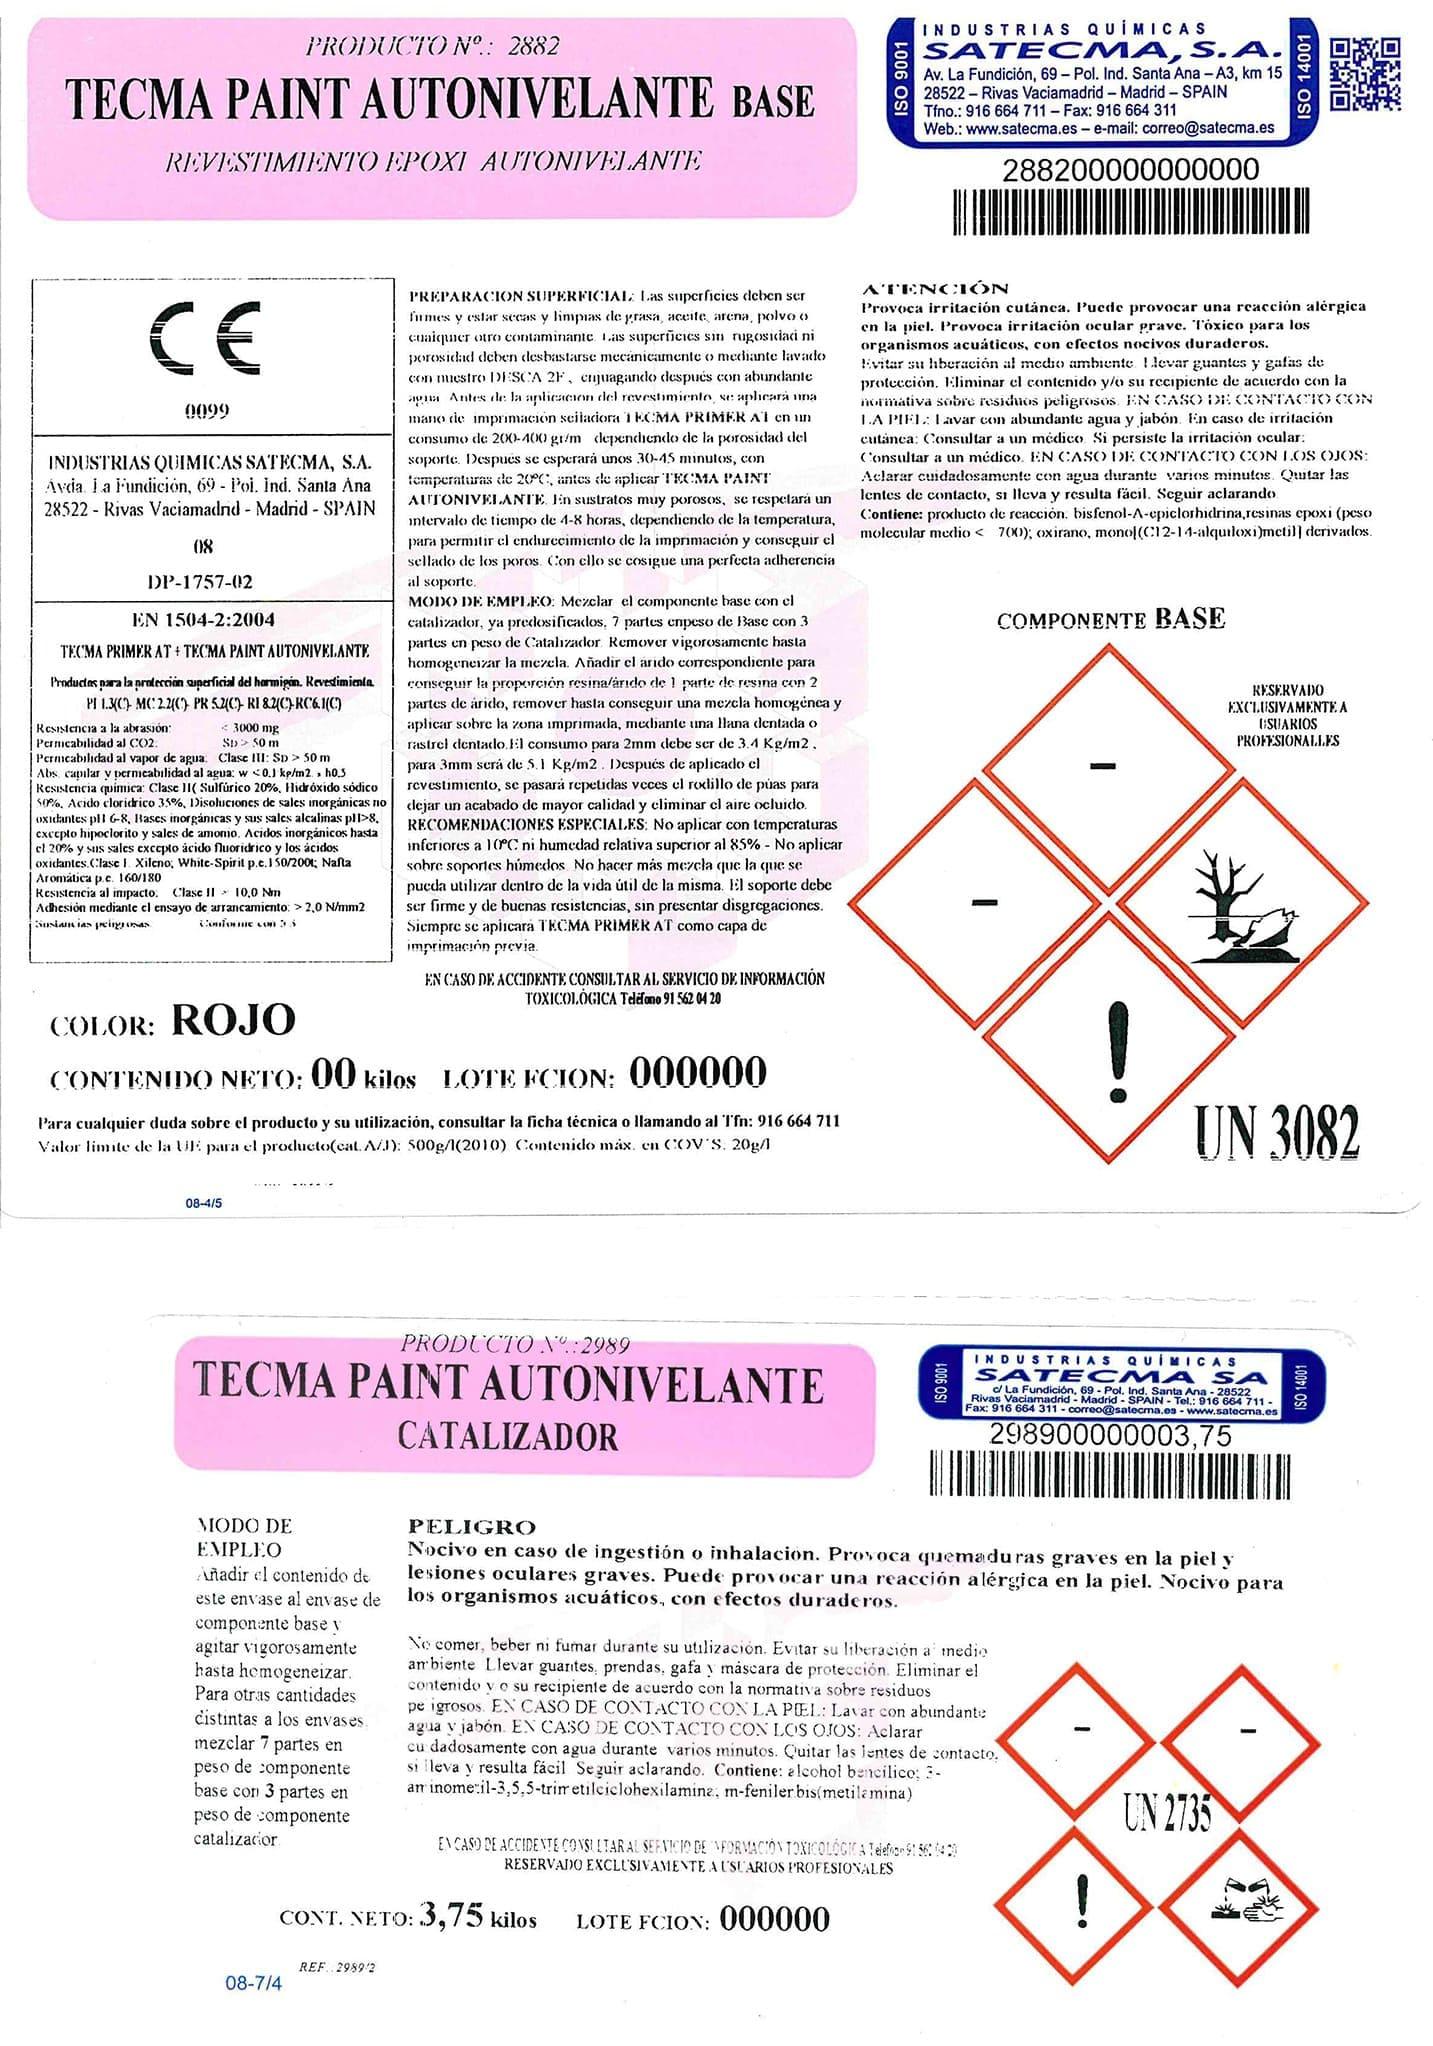 etiqueta revestimiento epoxi autonivel